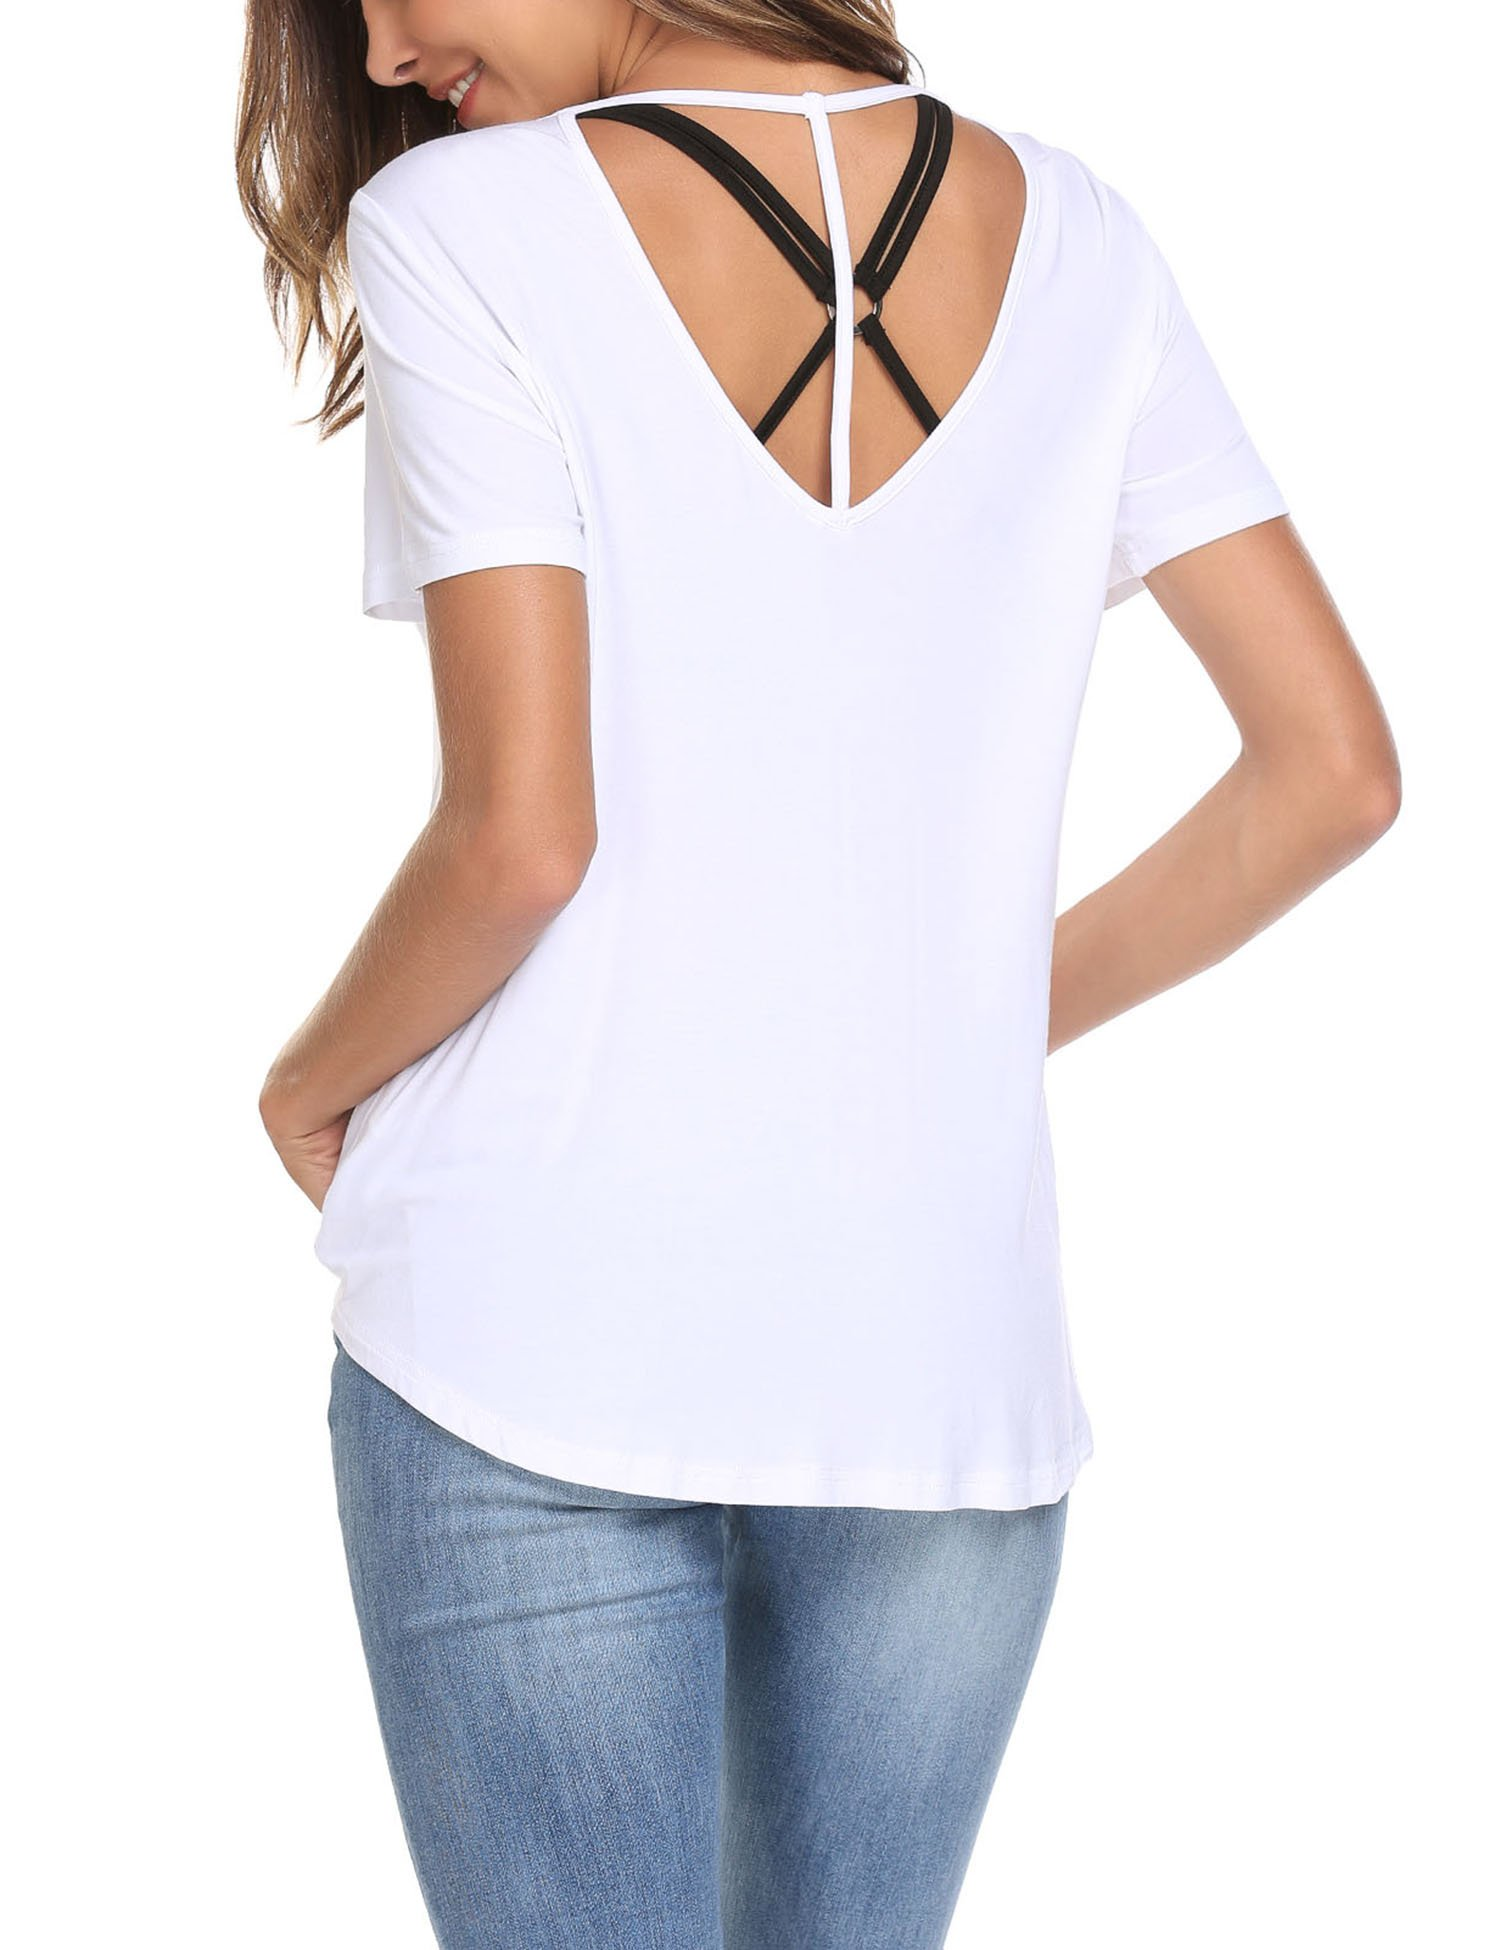 ELESOL Women Slim Fit Summer Tops Lightweight Basic High Low Hem T-Shirts White XXL by ELESOL (Image #2)